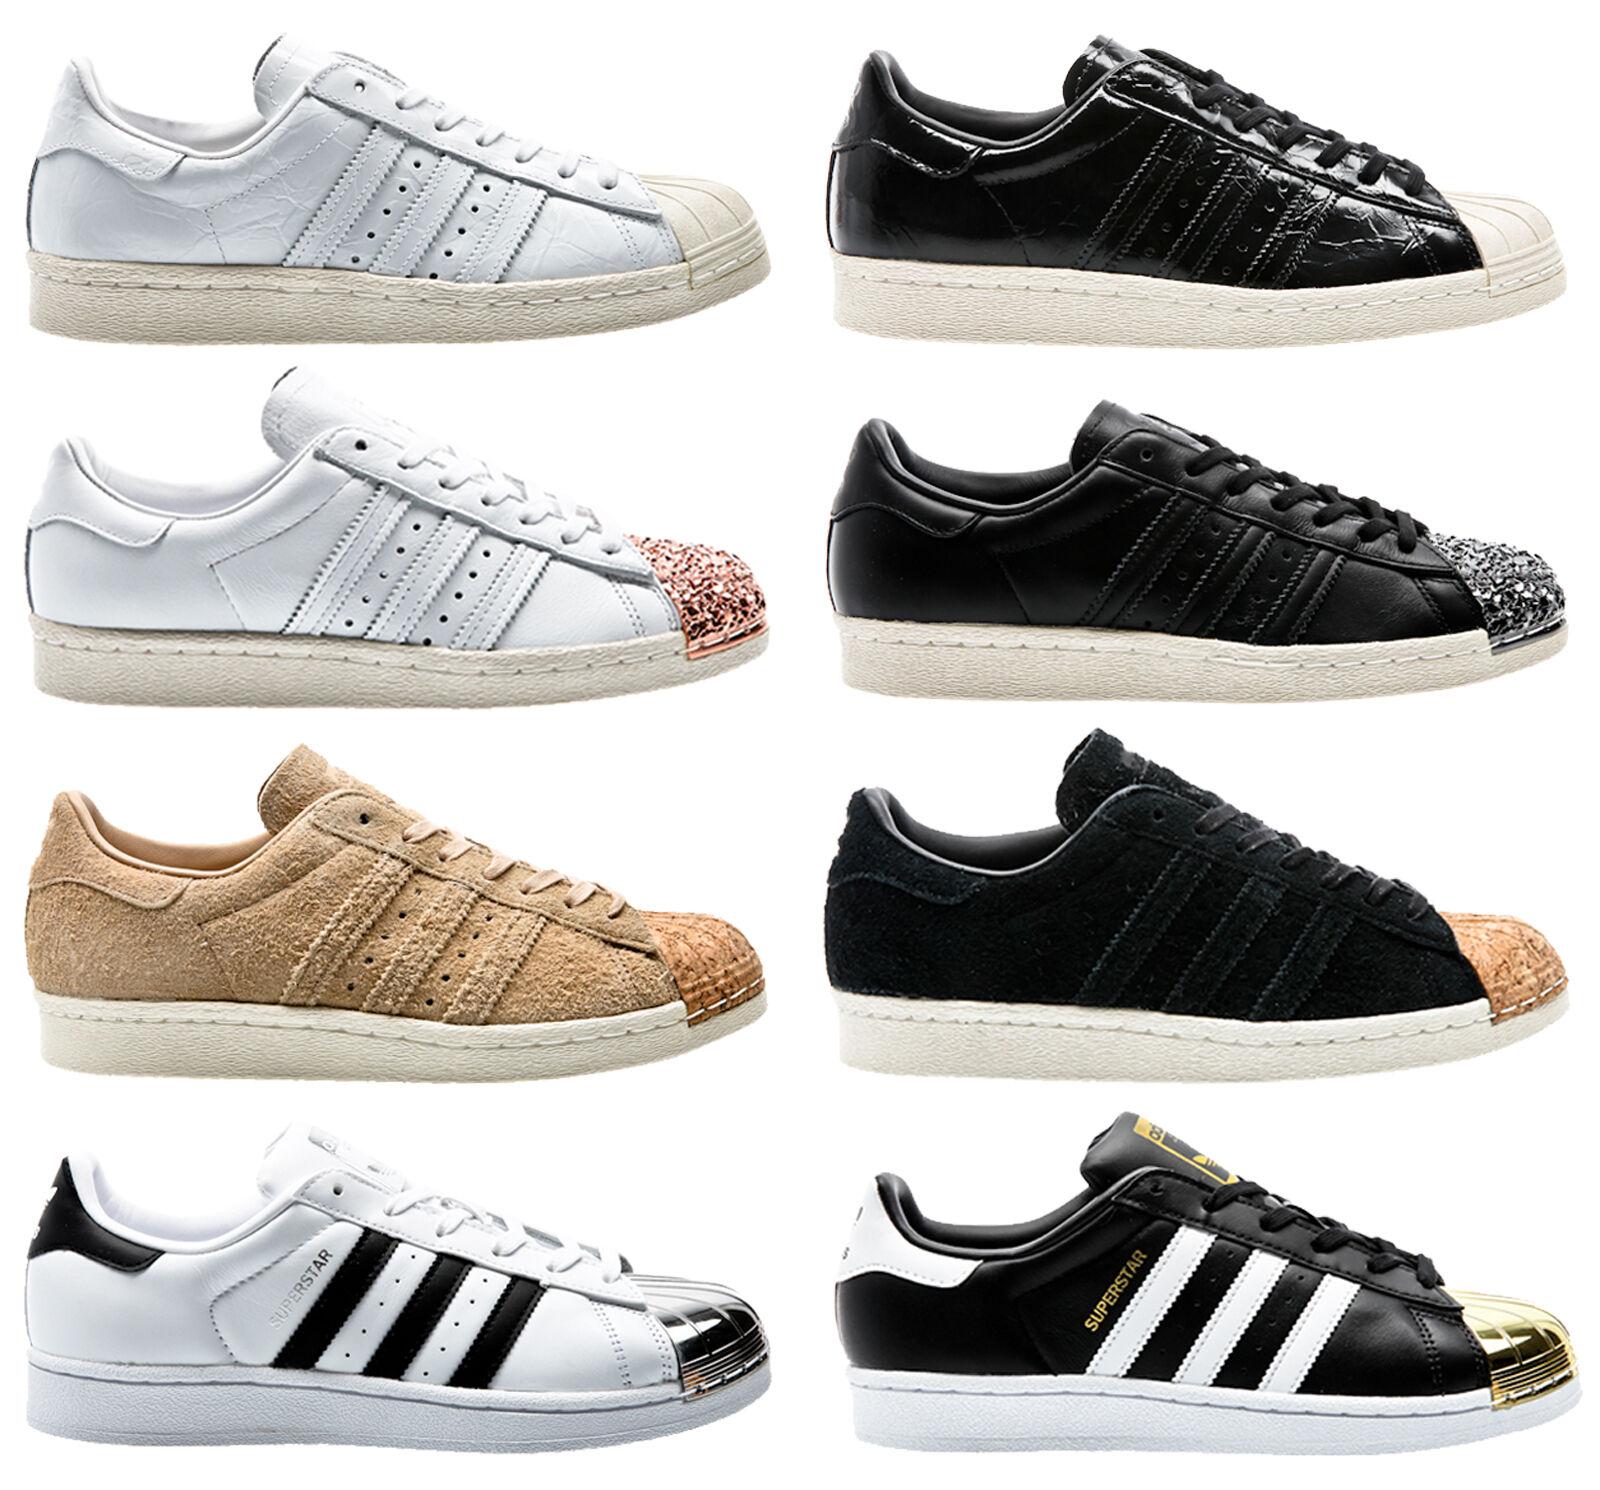 Adidas ORIGINALS superstar 80s w 3d MT femmes baskets Femmes chaussures chaussures